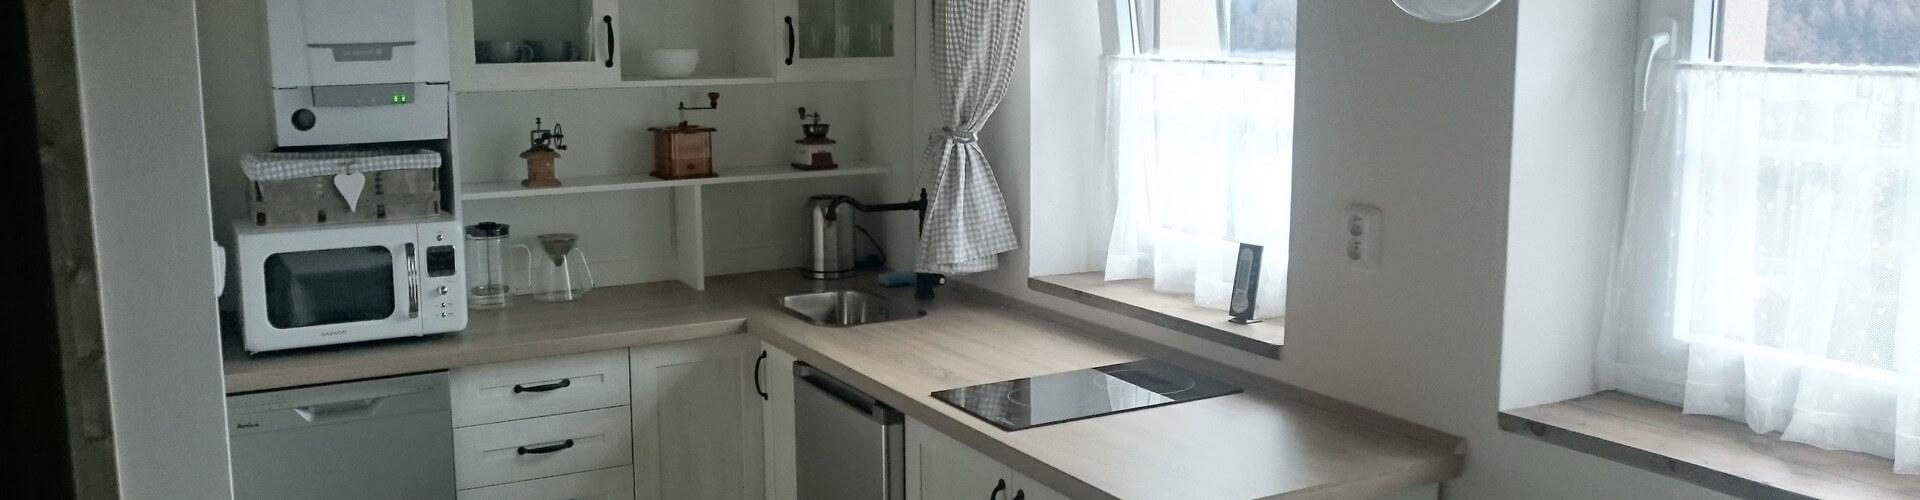 Apartmány - Kuchyň